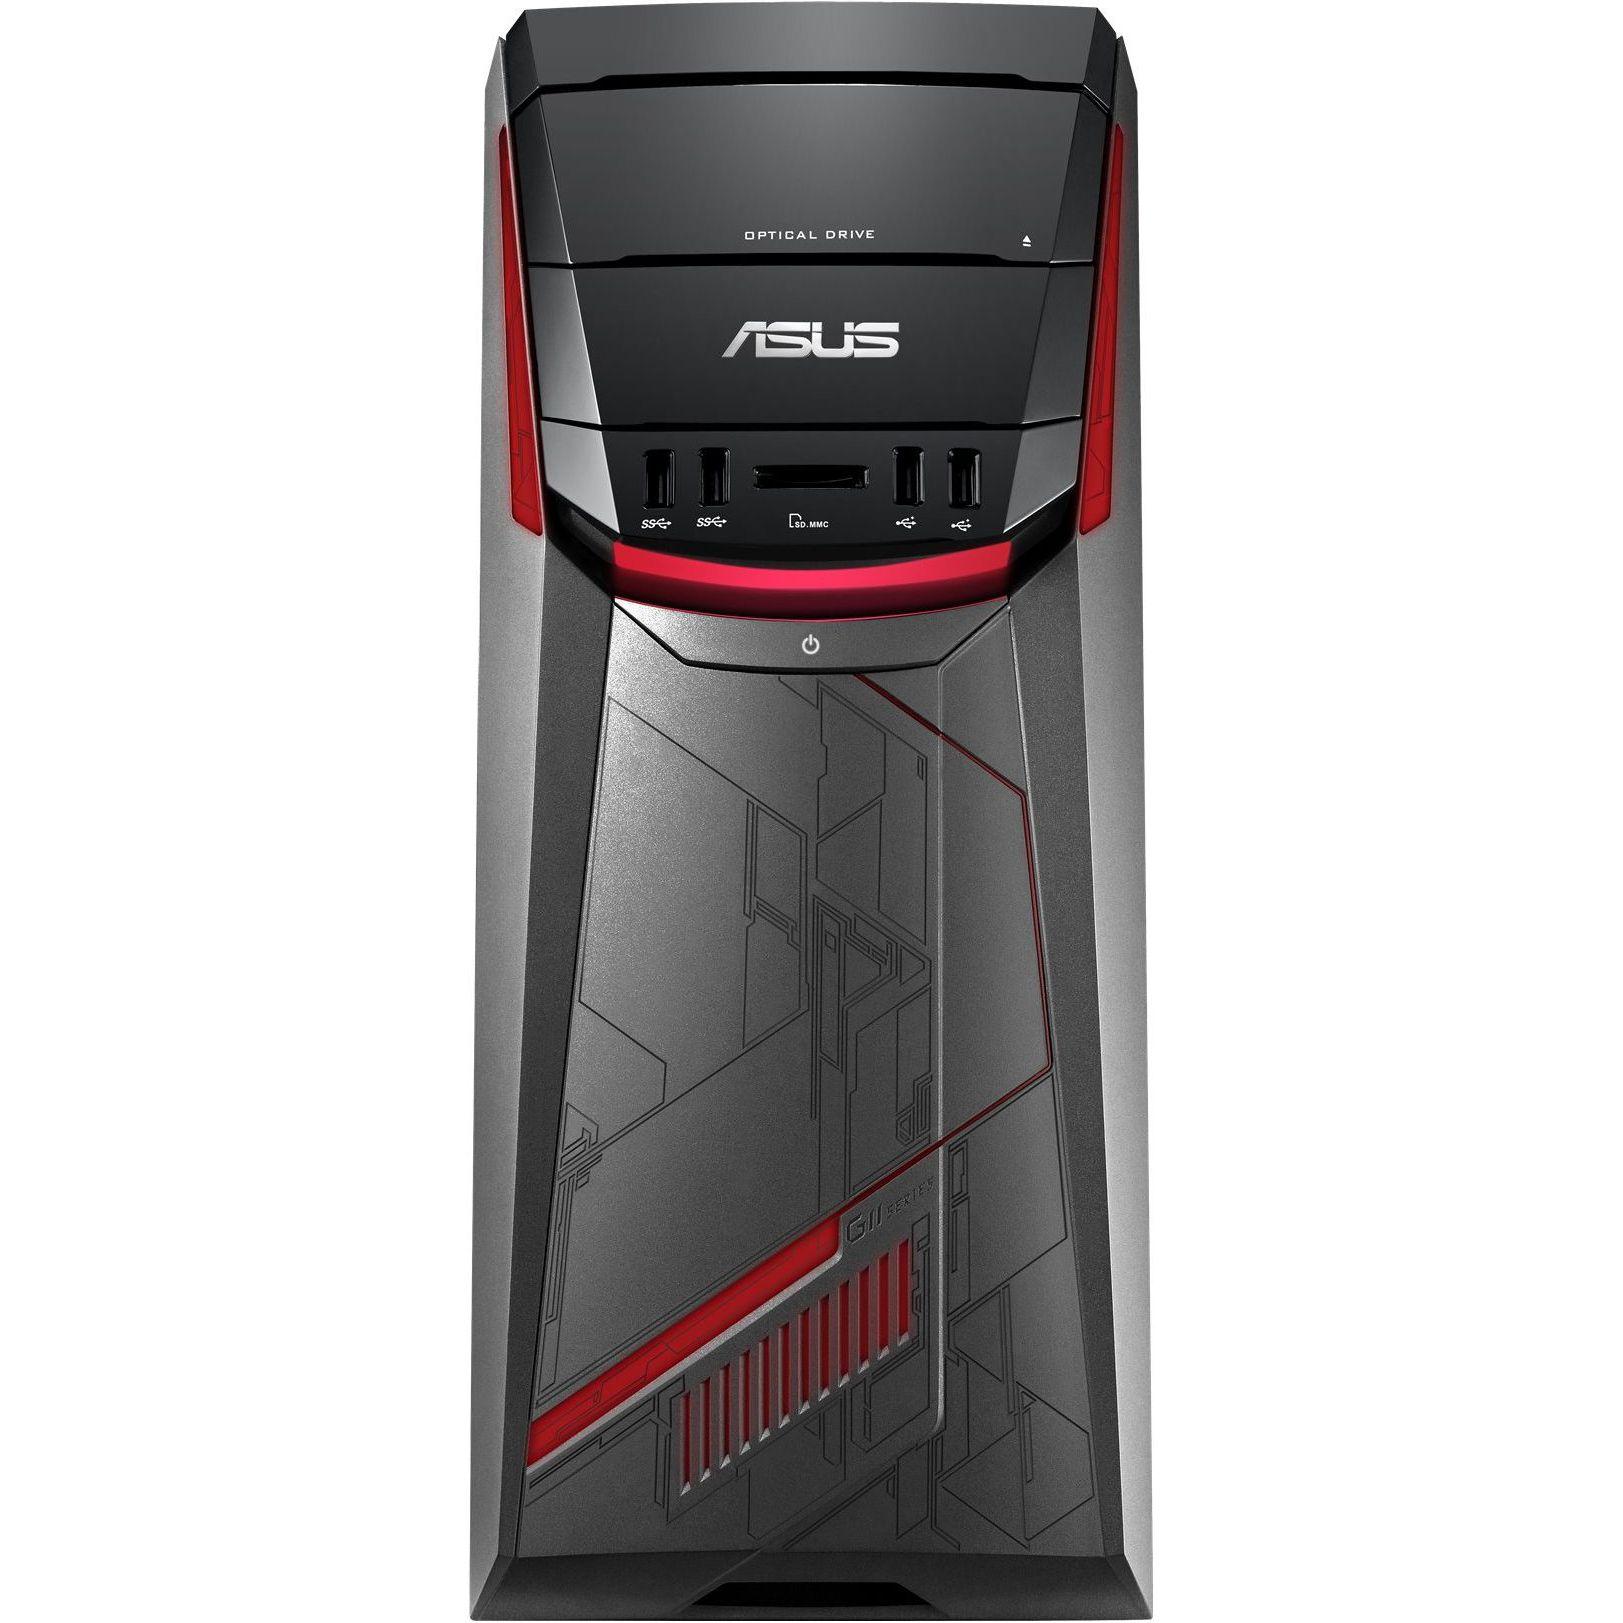 Sistem Brand Asus G11CD Intel Core i7-7700 GTX 1050-2GB RAM 8GB HDD 1TB Endless OS